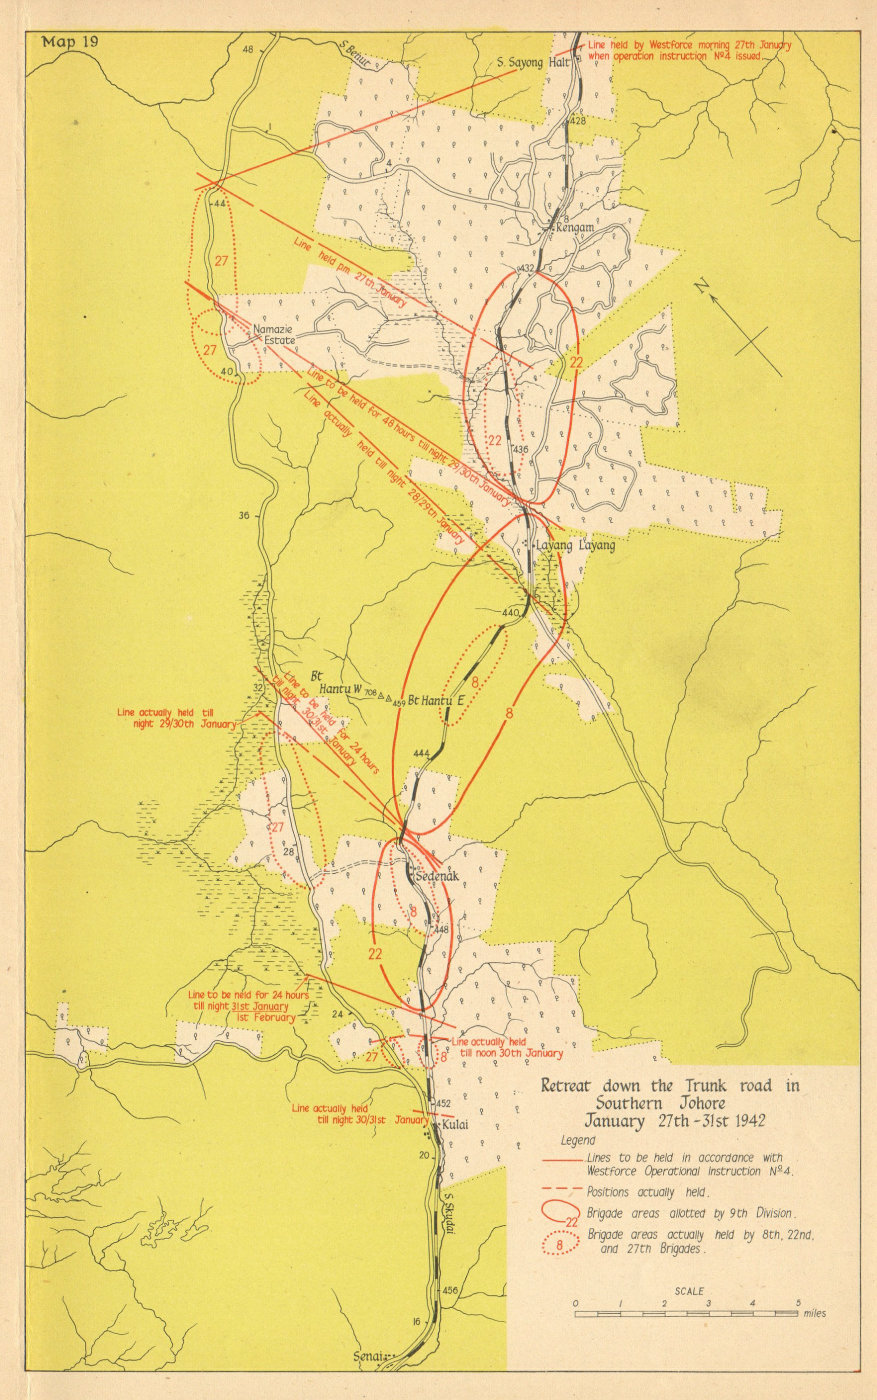 Associate Product Japanese invasion of Malaya. Retreat in southern Johore, 27-31 Jan 1942 1957 map